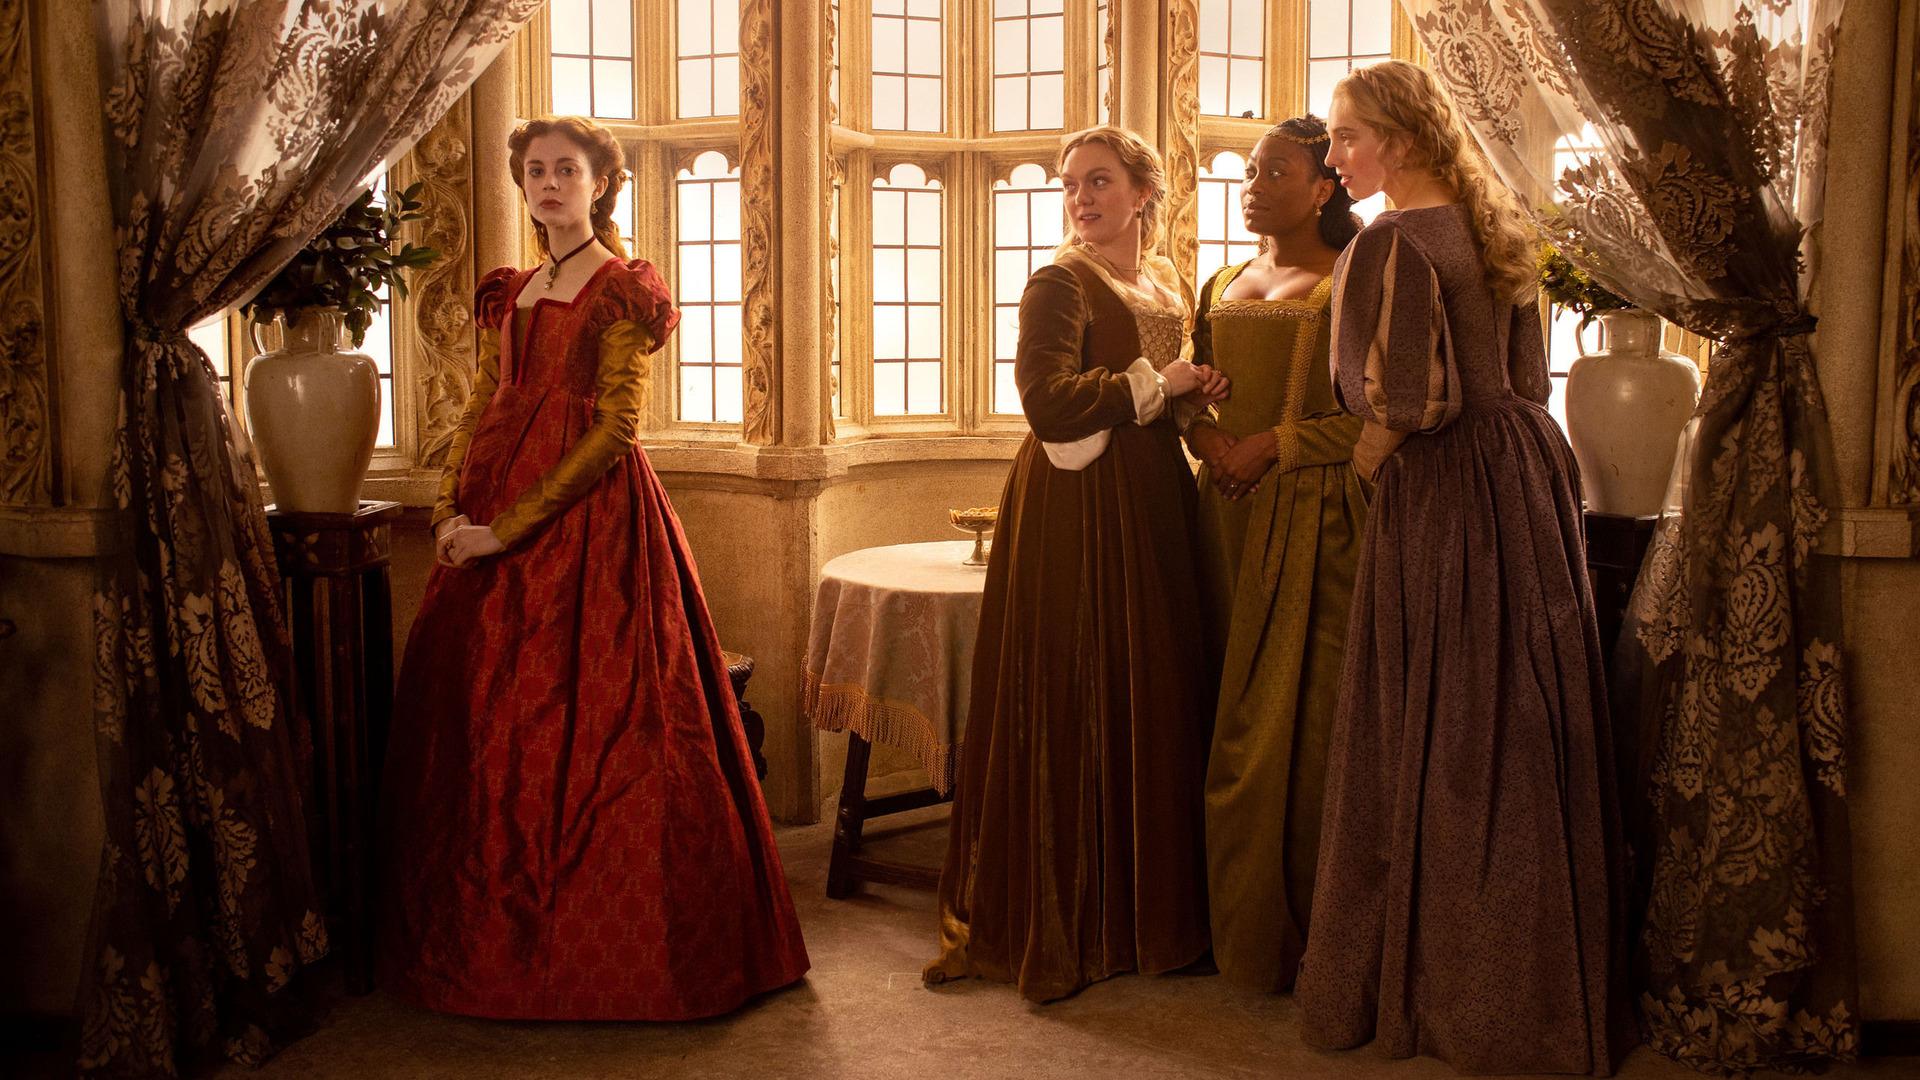 Испанская принцесса — s02e04 — The Other Woman